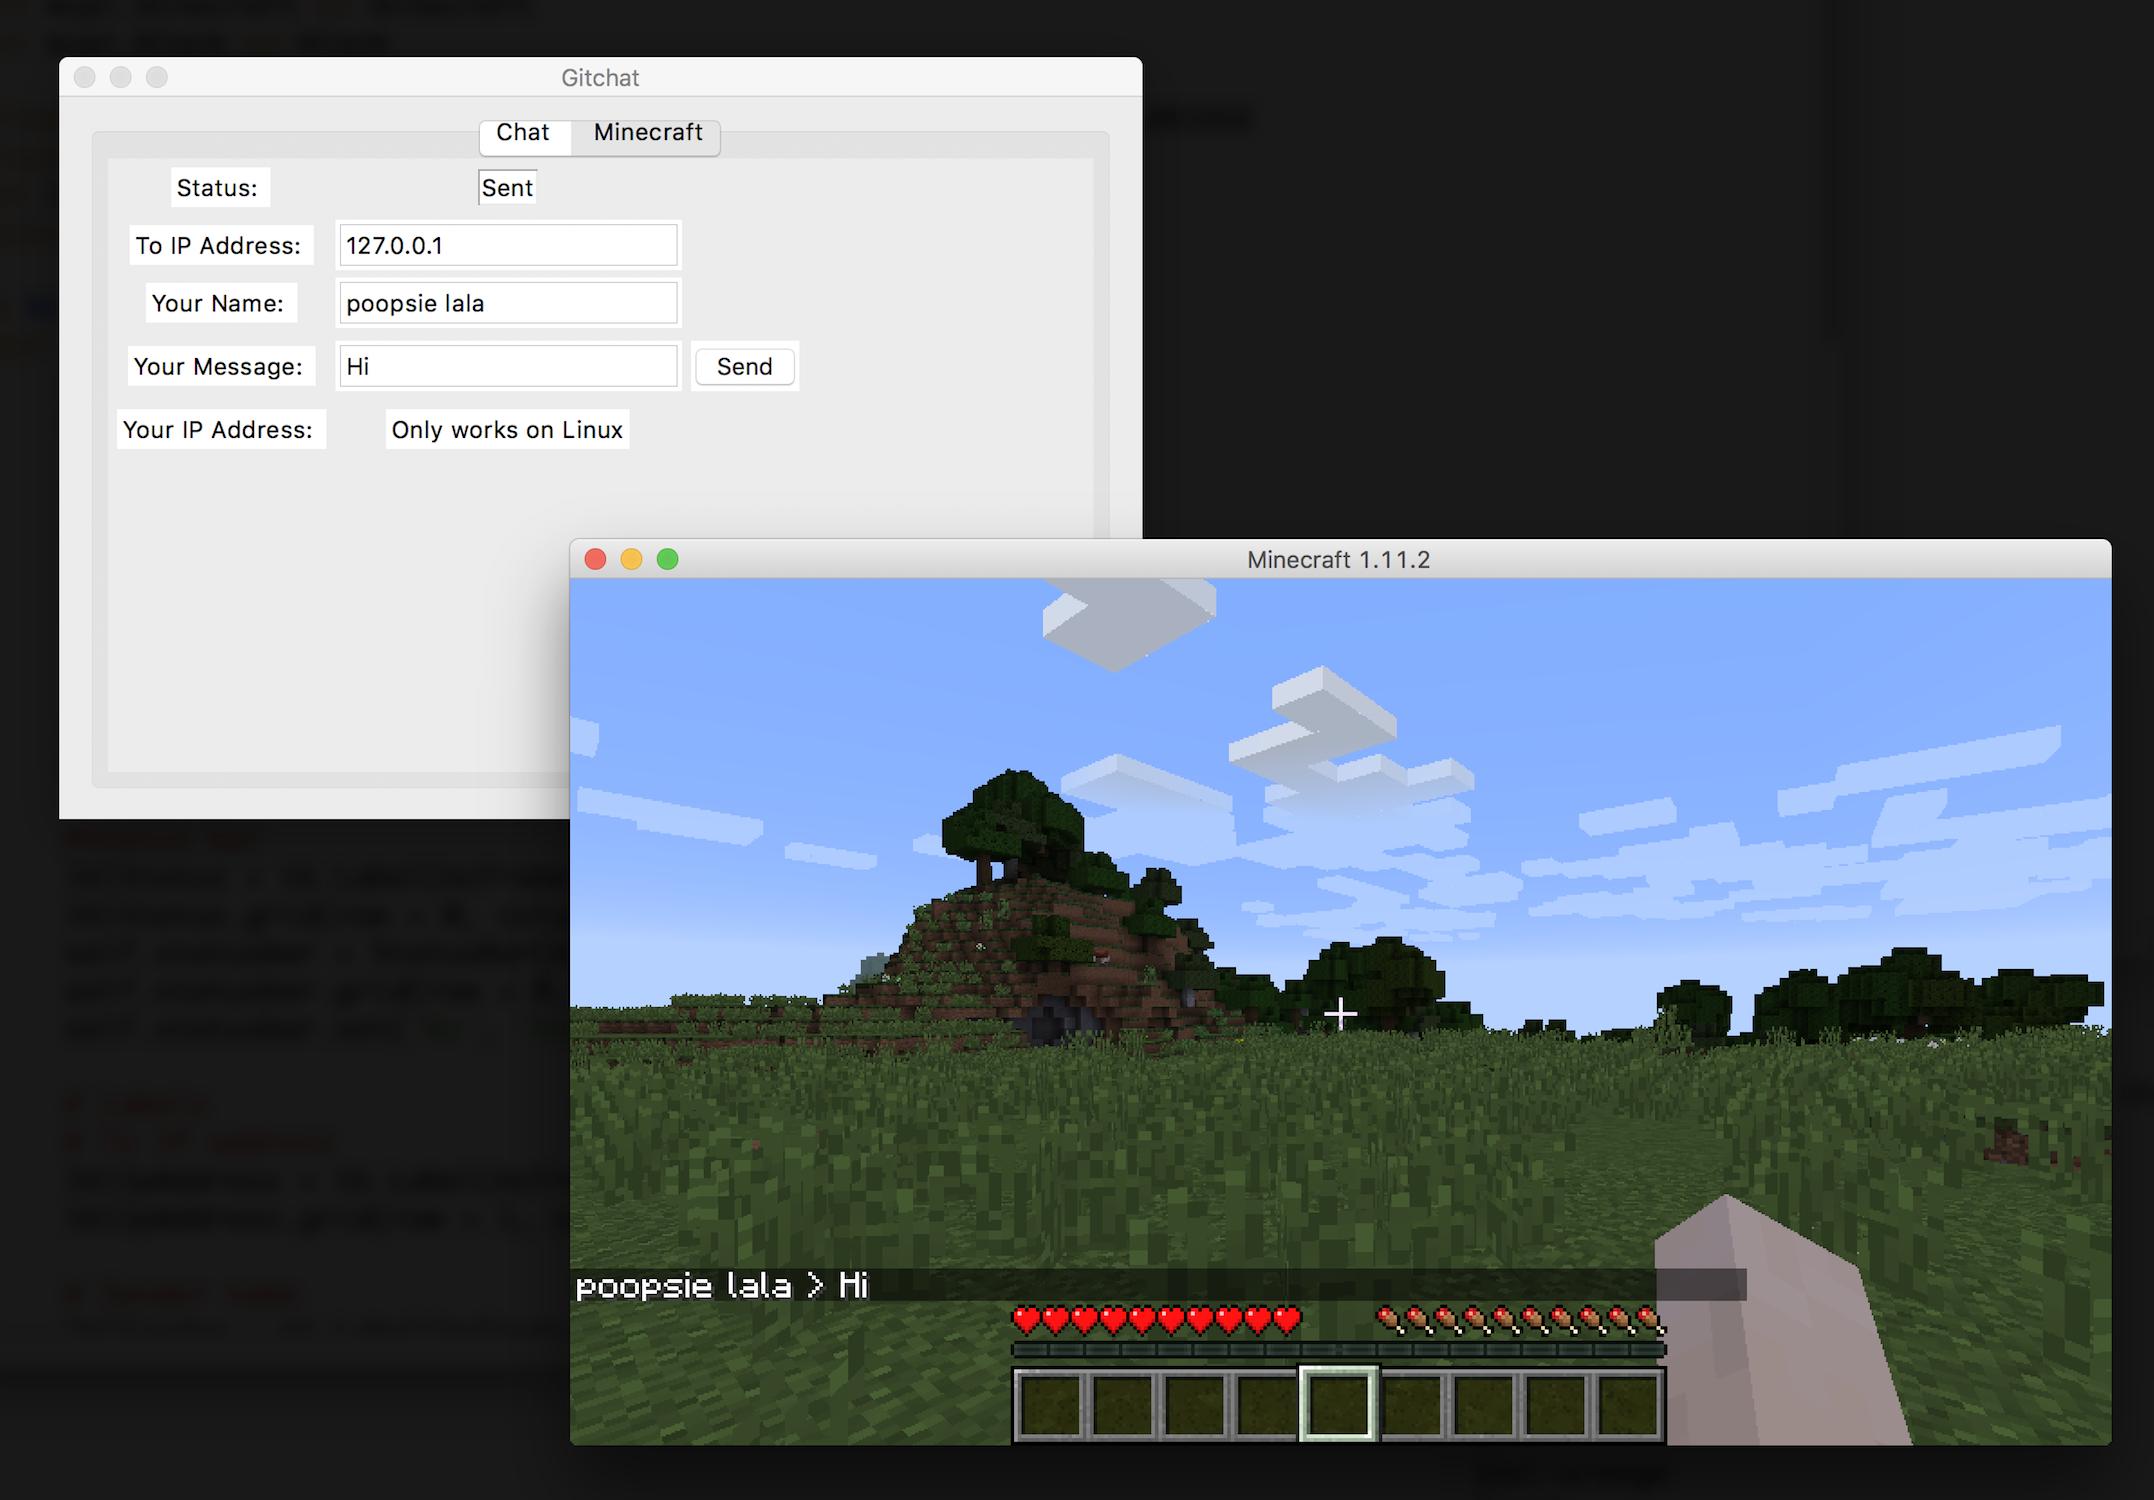 Image of Gitchat Minecraft